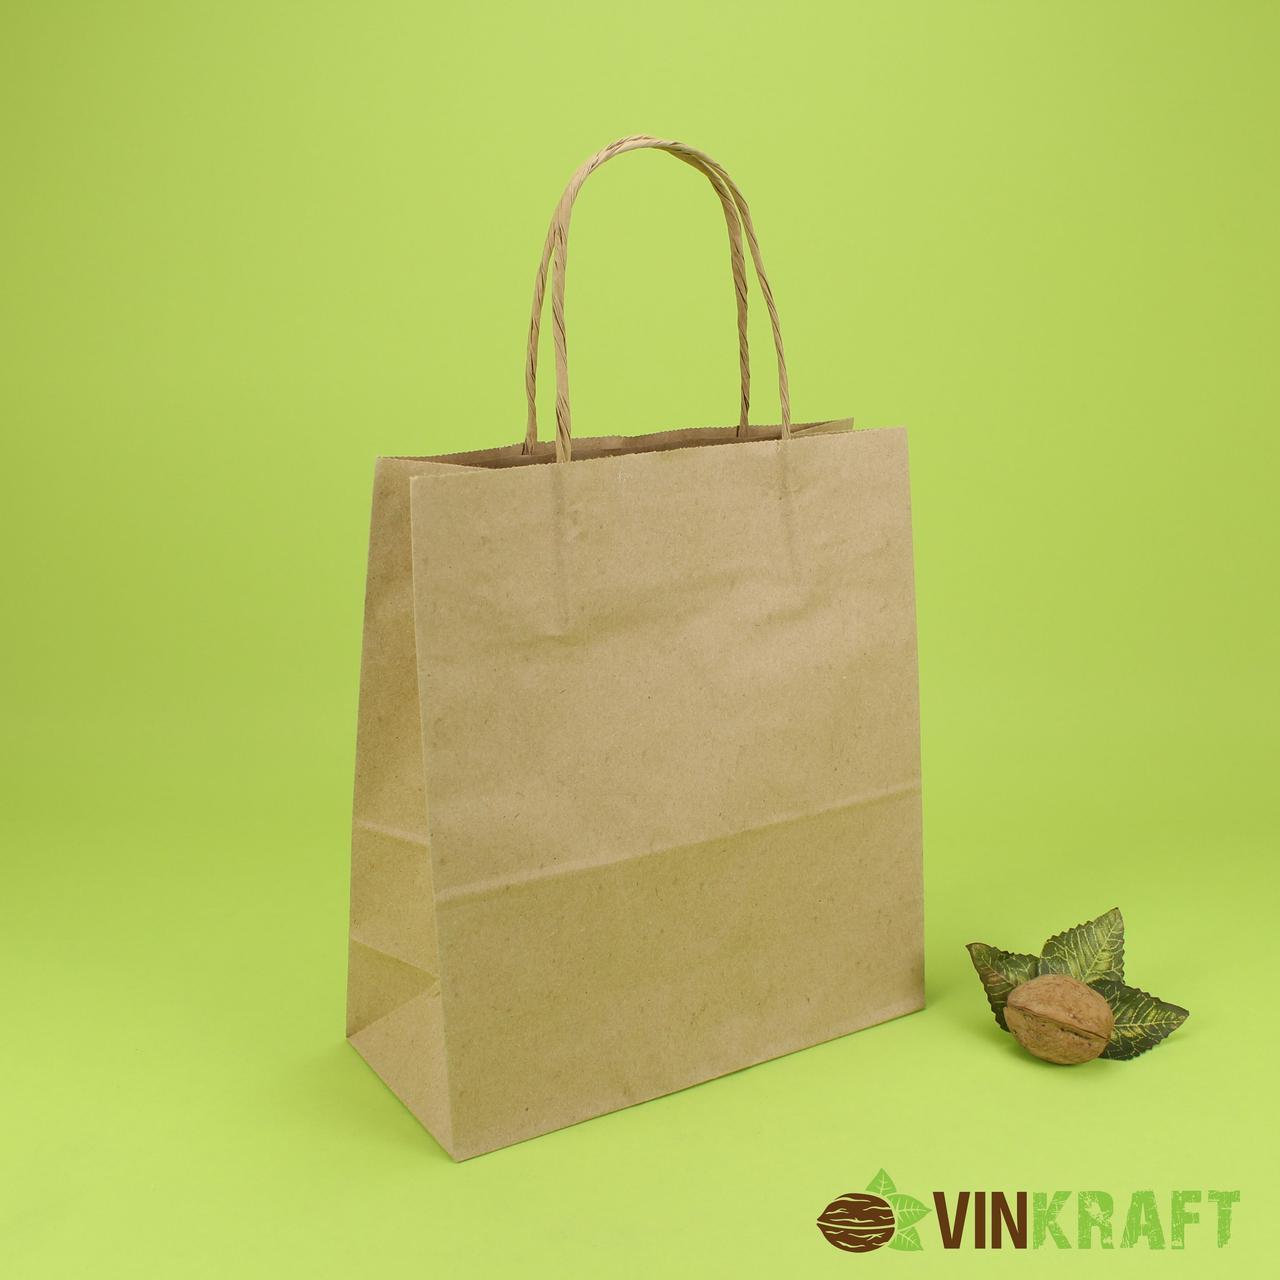 Паперовий пакет з ручками 200*90*220 (70 г/м2) (2 кг), крафт